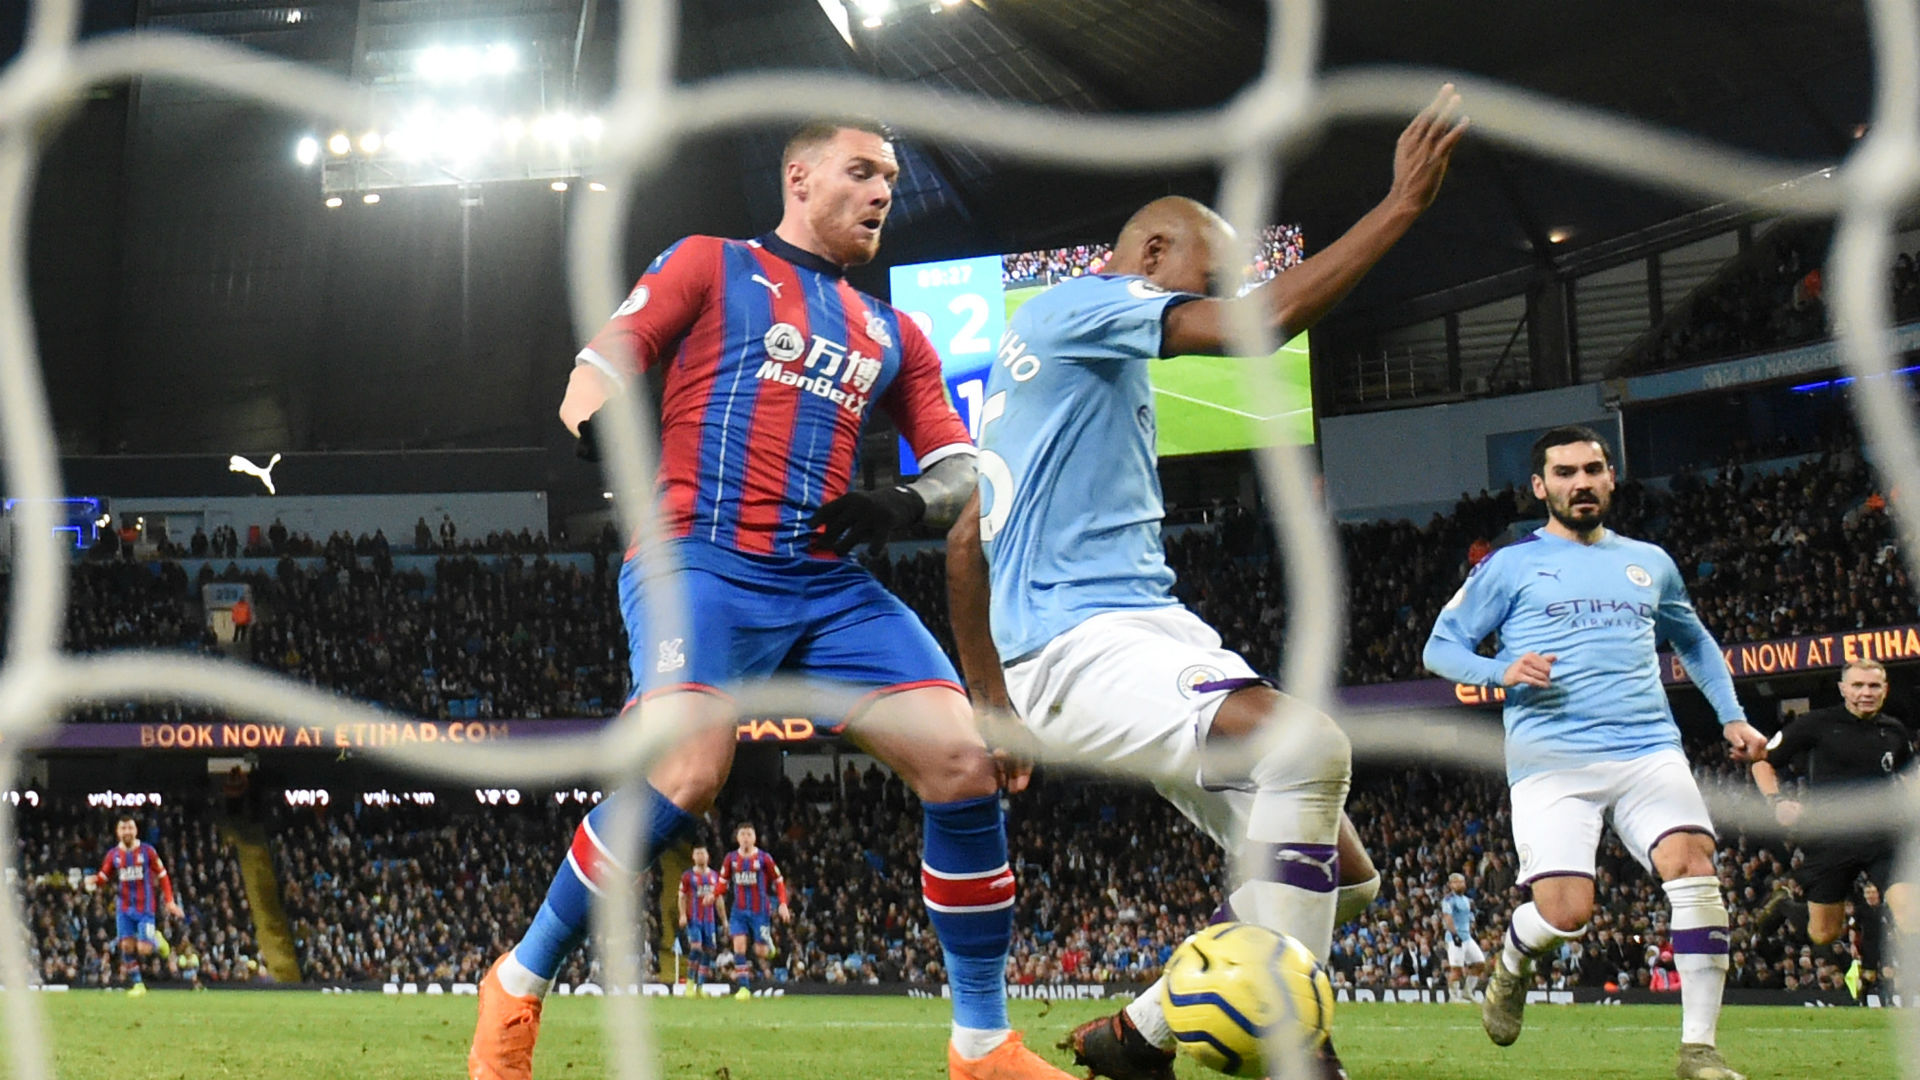 Manchester City 2-2 Crystal Palace: Aguero brace in vain as Palace pilfer point